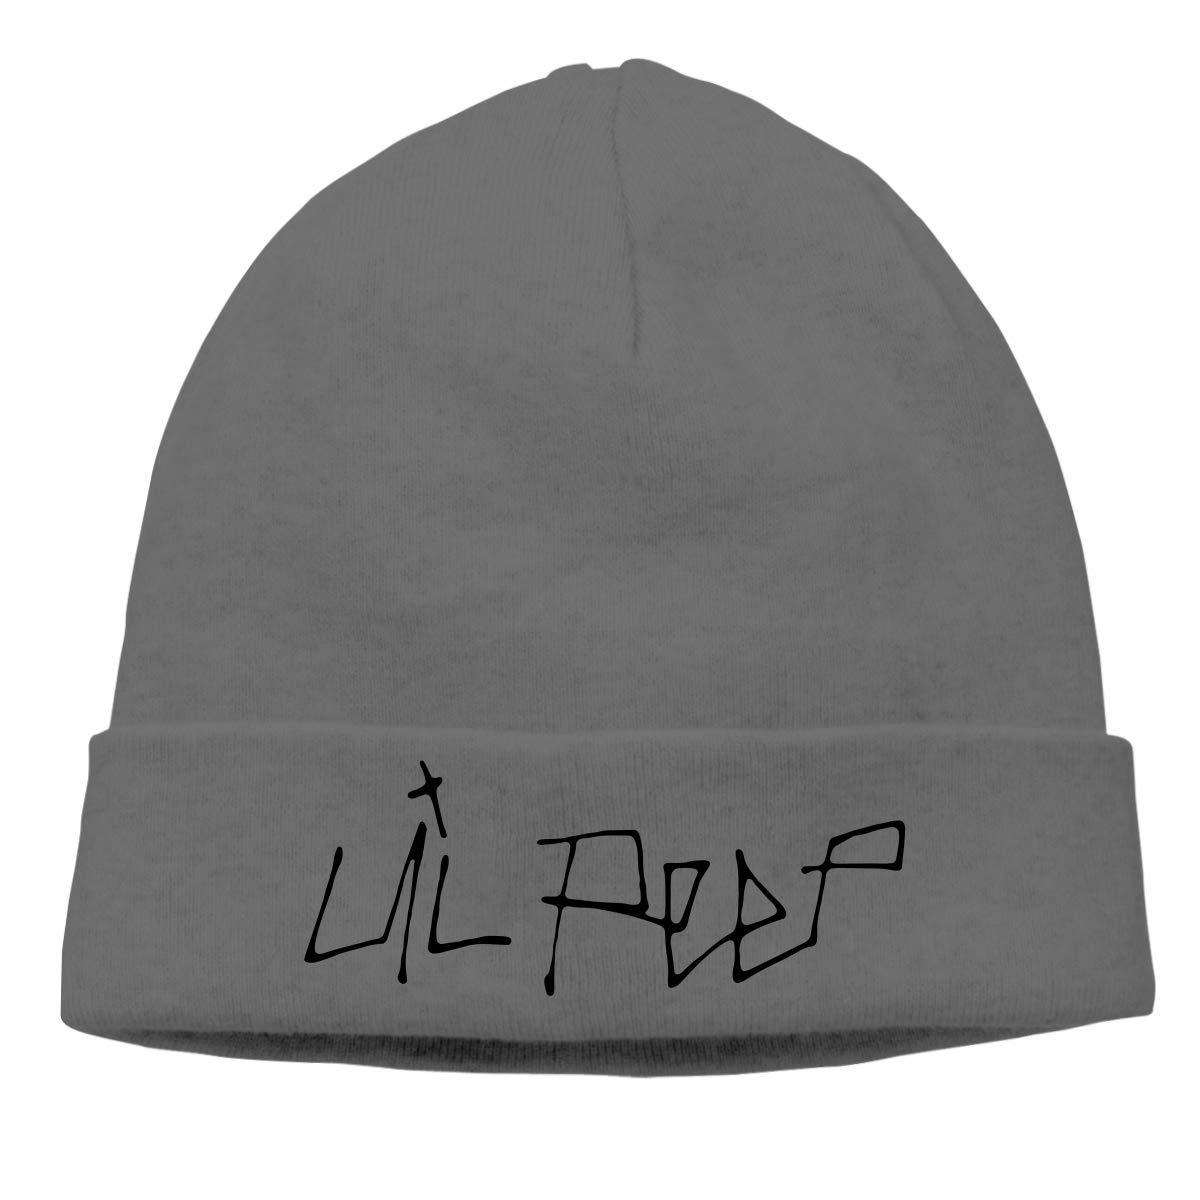 CHKWYN Lil Peep Logo Skull Hats Knitted Cap Beanie White